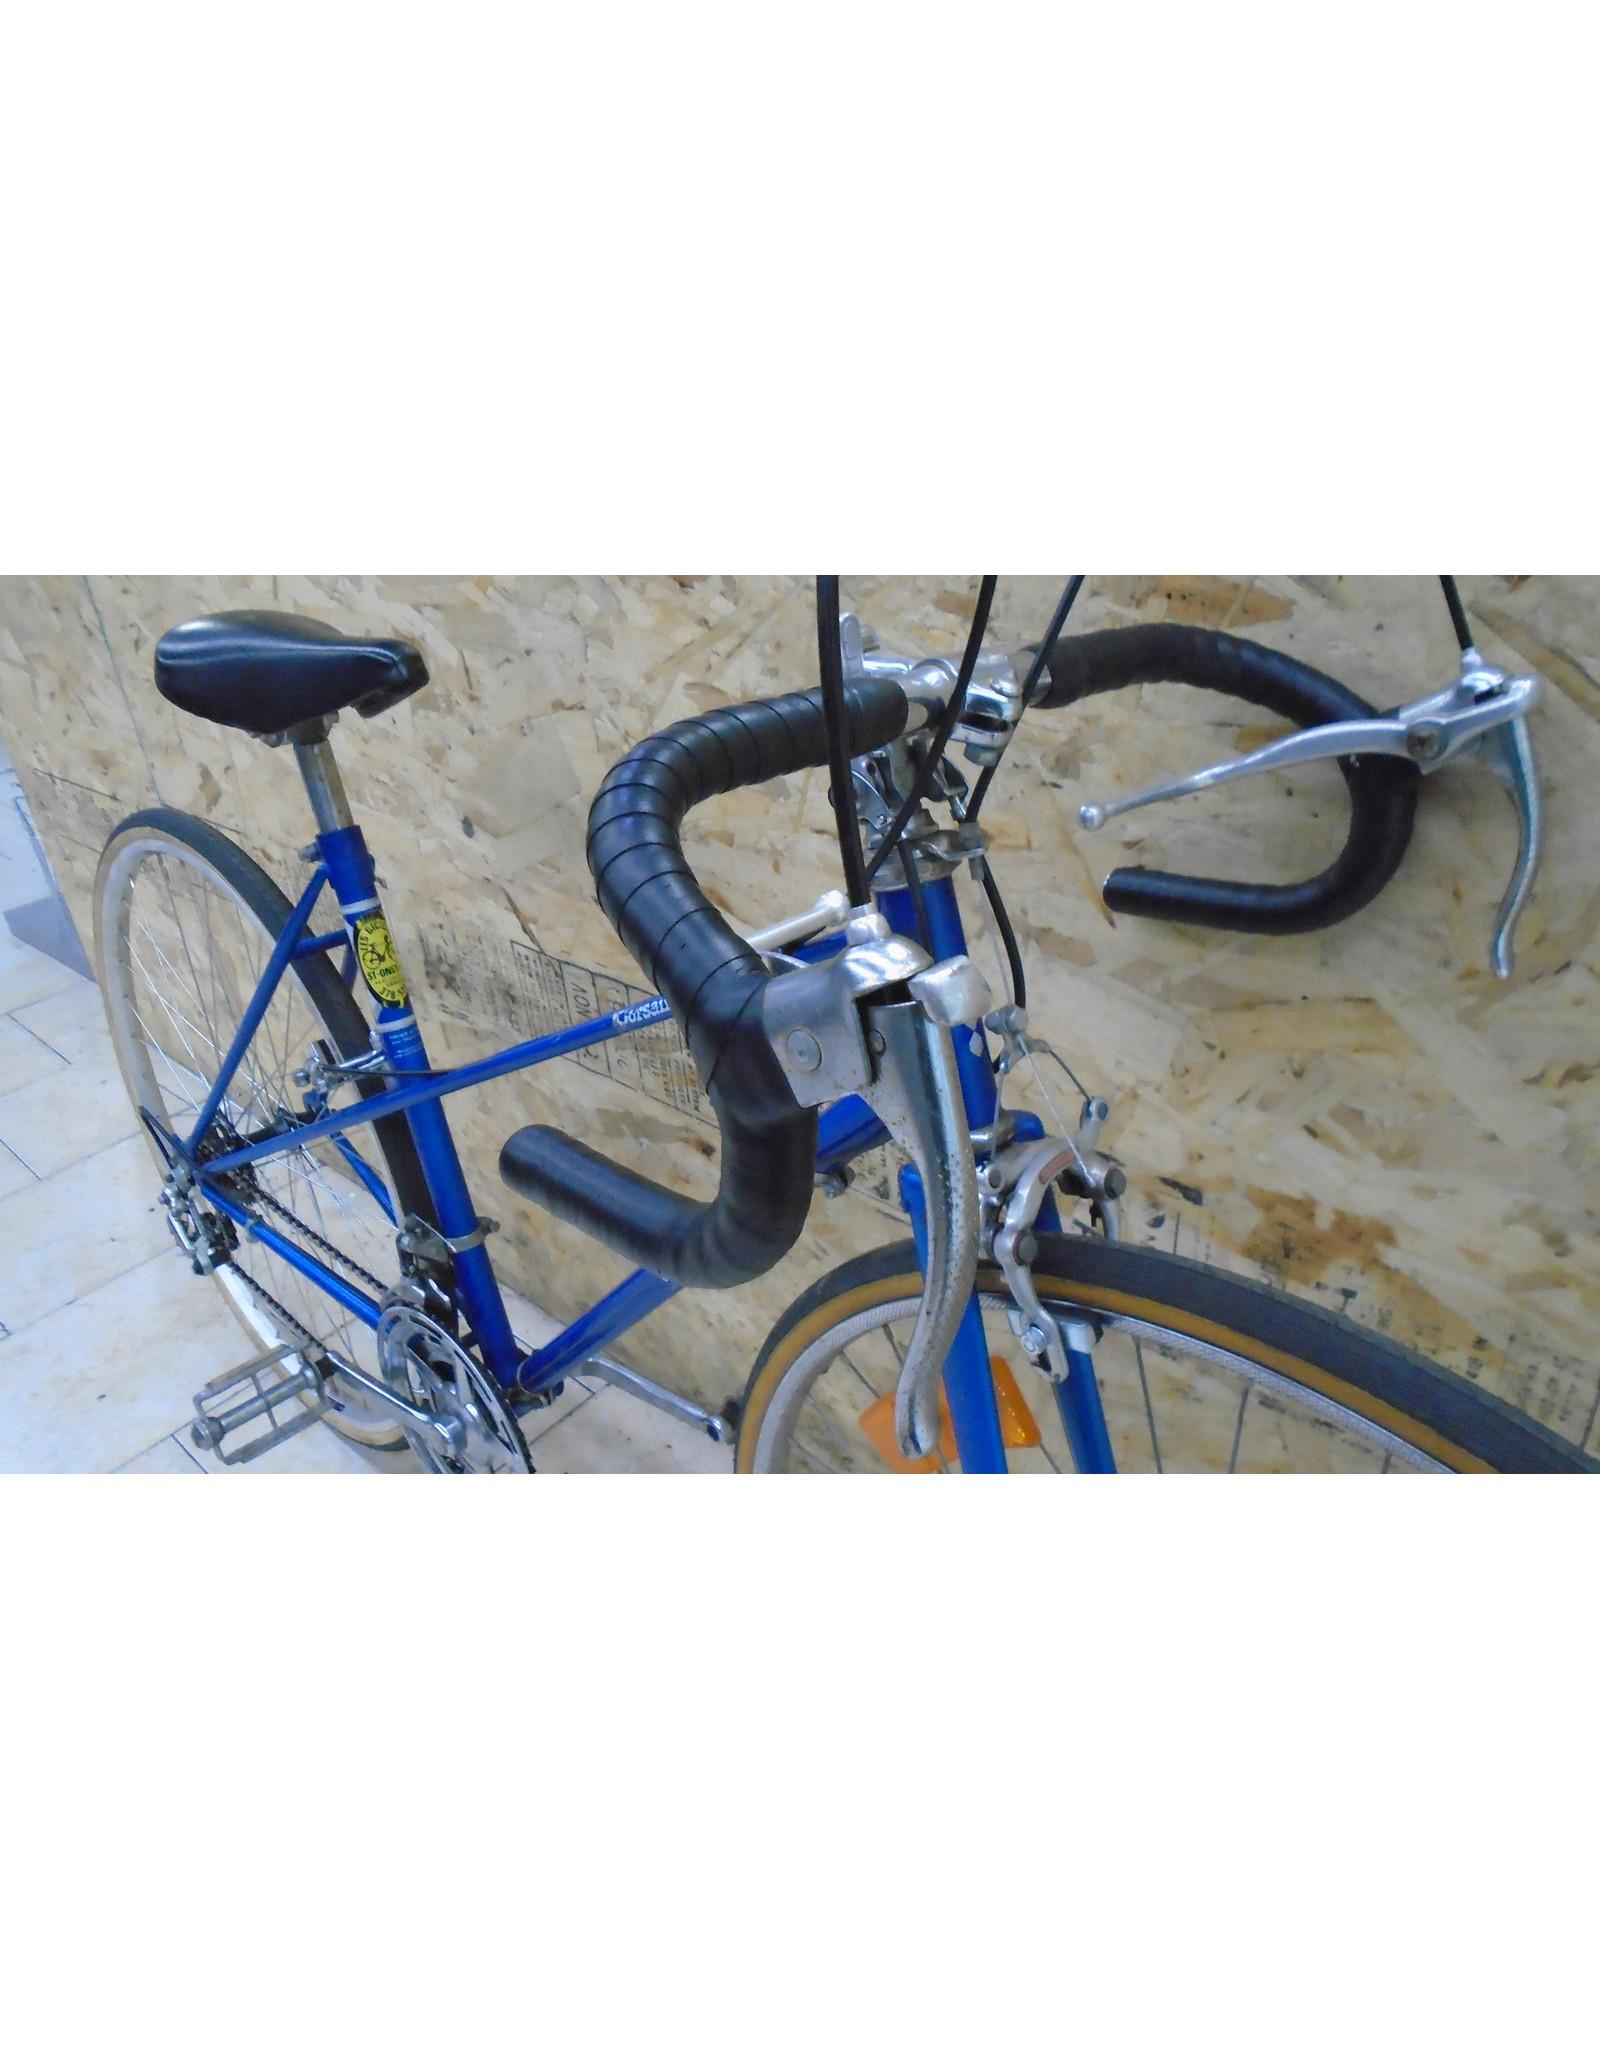 "Vélo usagé de route Veloclub 19"" - 9086"